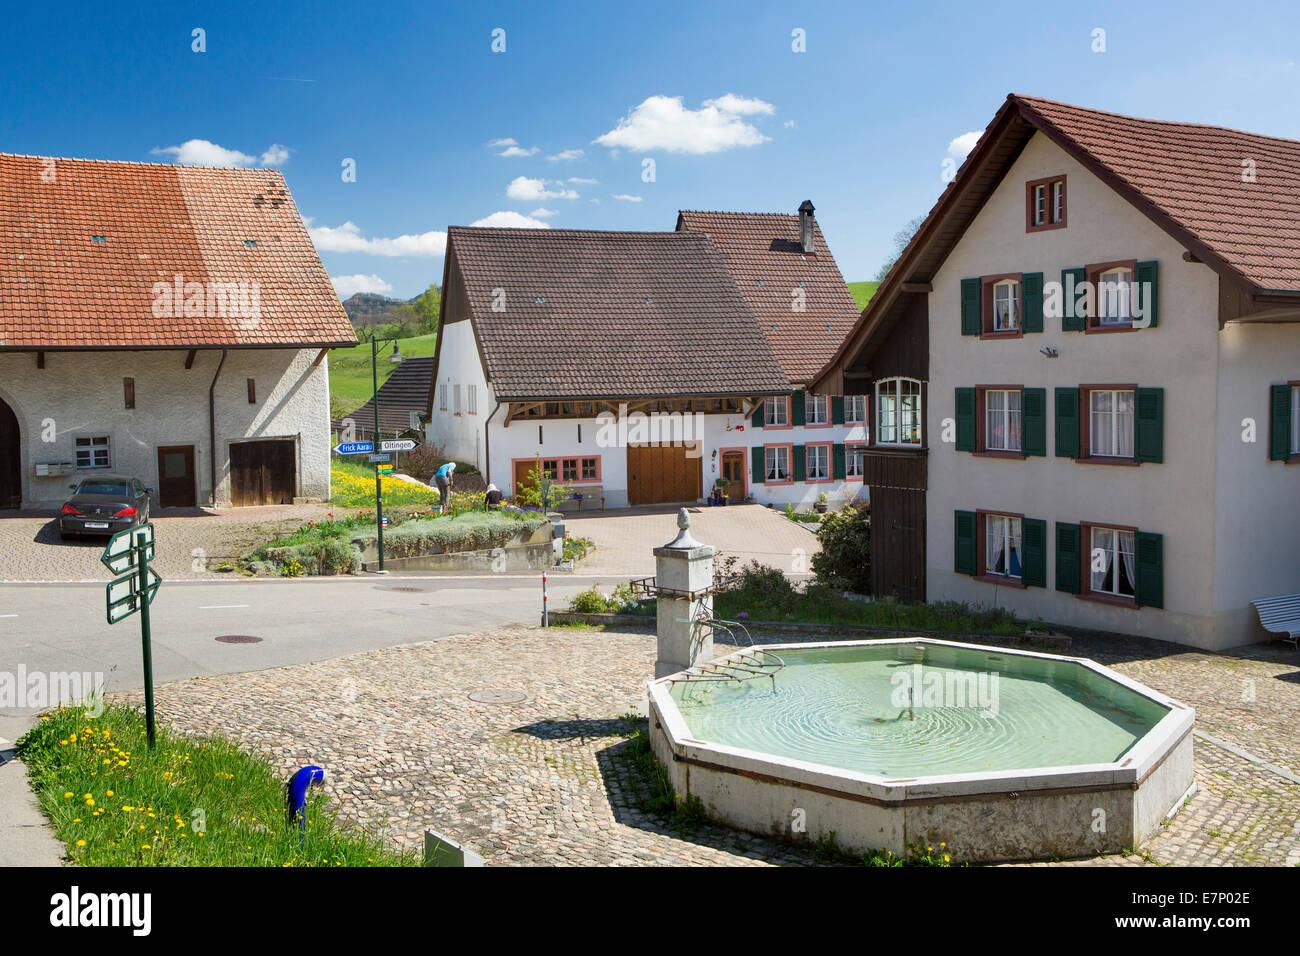 Anwil, spring, canton, Basel land, village, Switzerland, Europe, - Stock Image